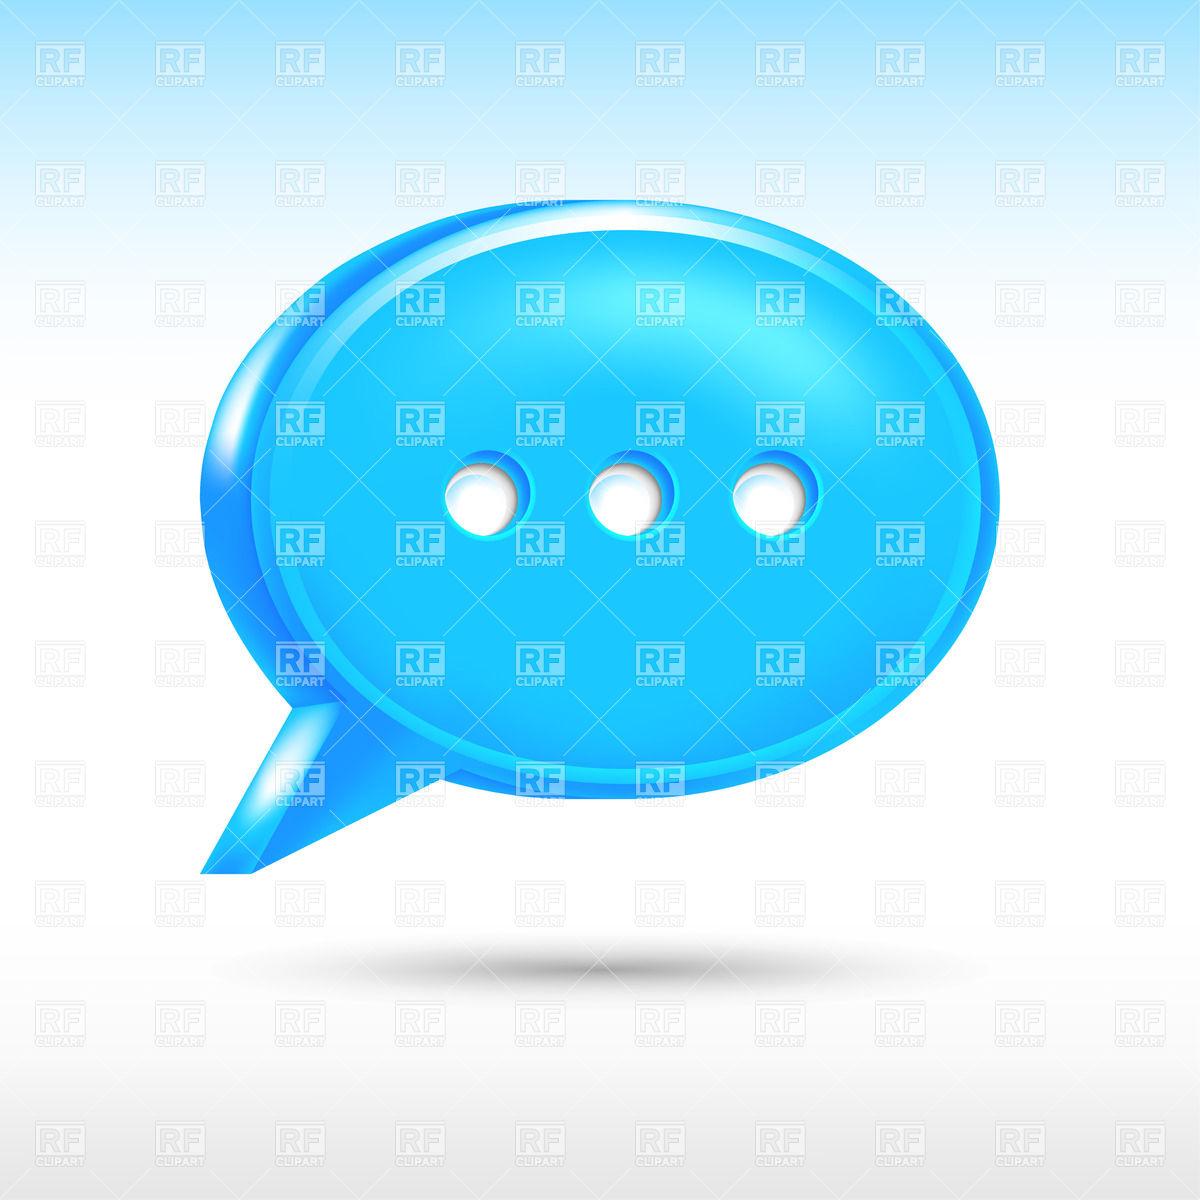 Blue speech bubble with ellipsis icon Vector Image #13223.